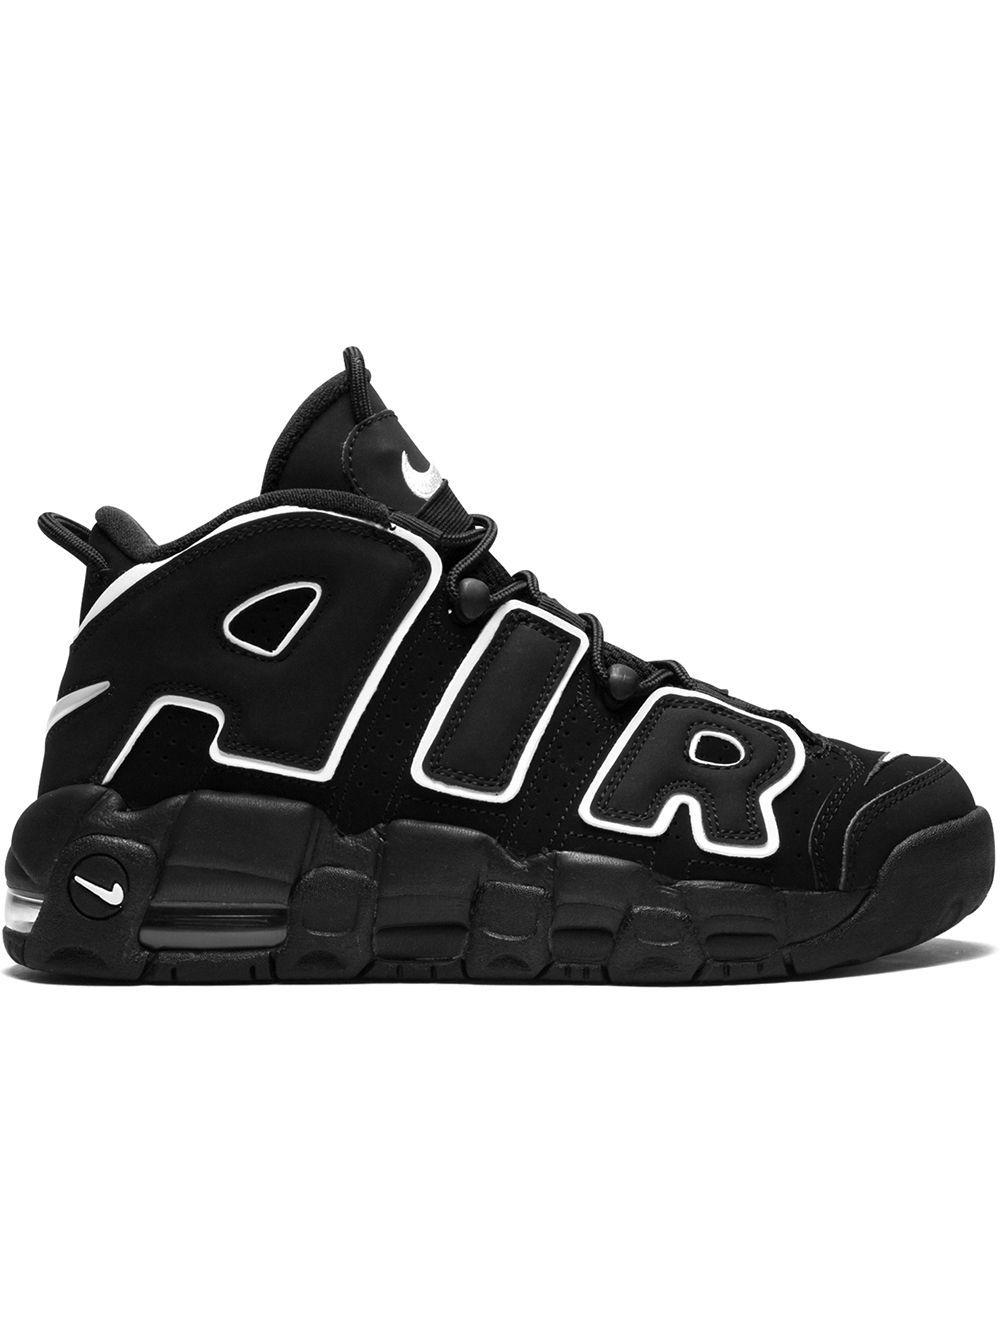 GS Nike Air More Uptempo Basketball Shoes